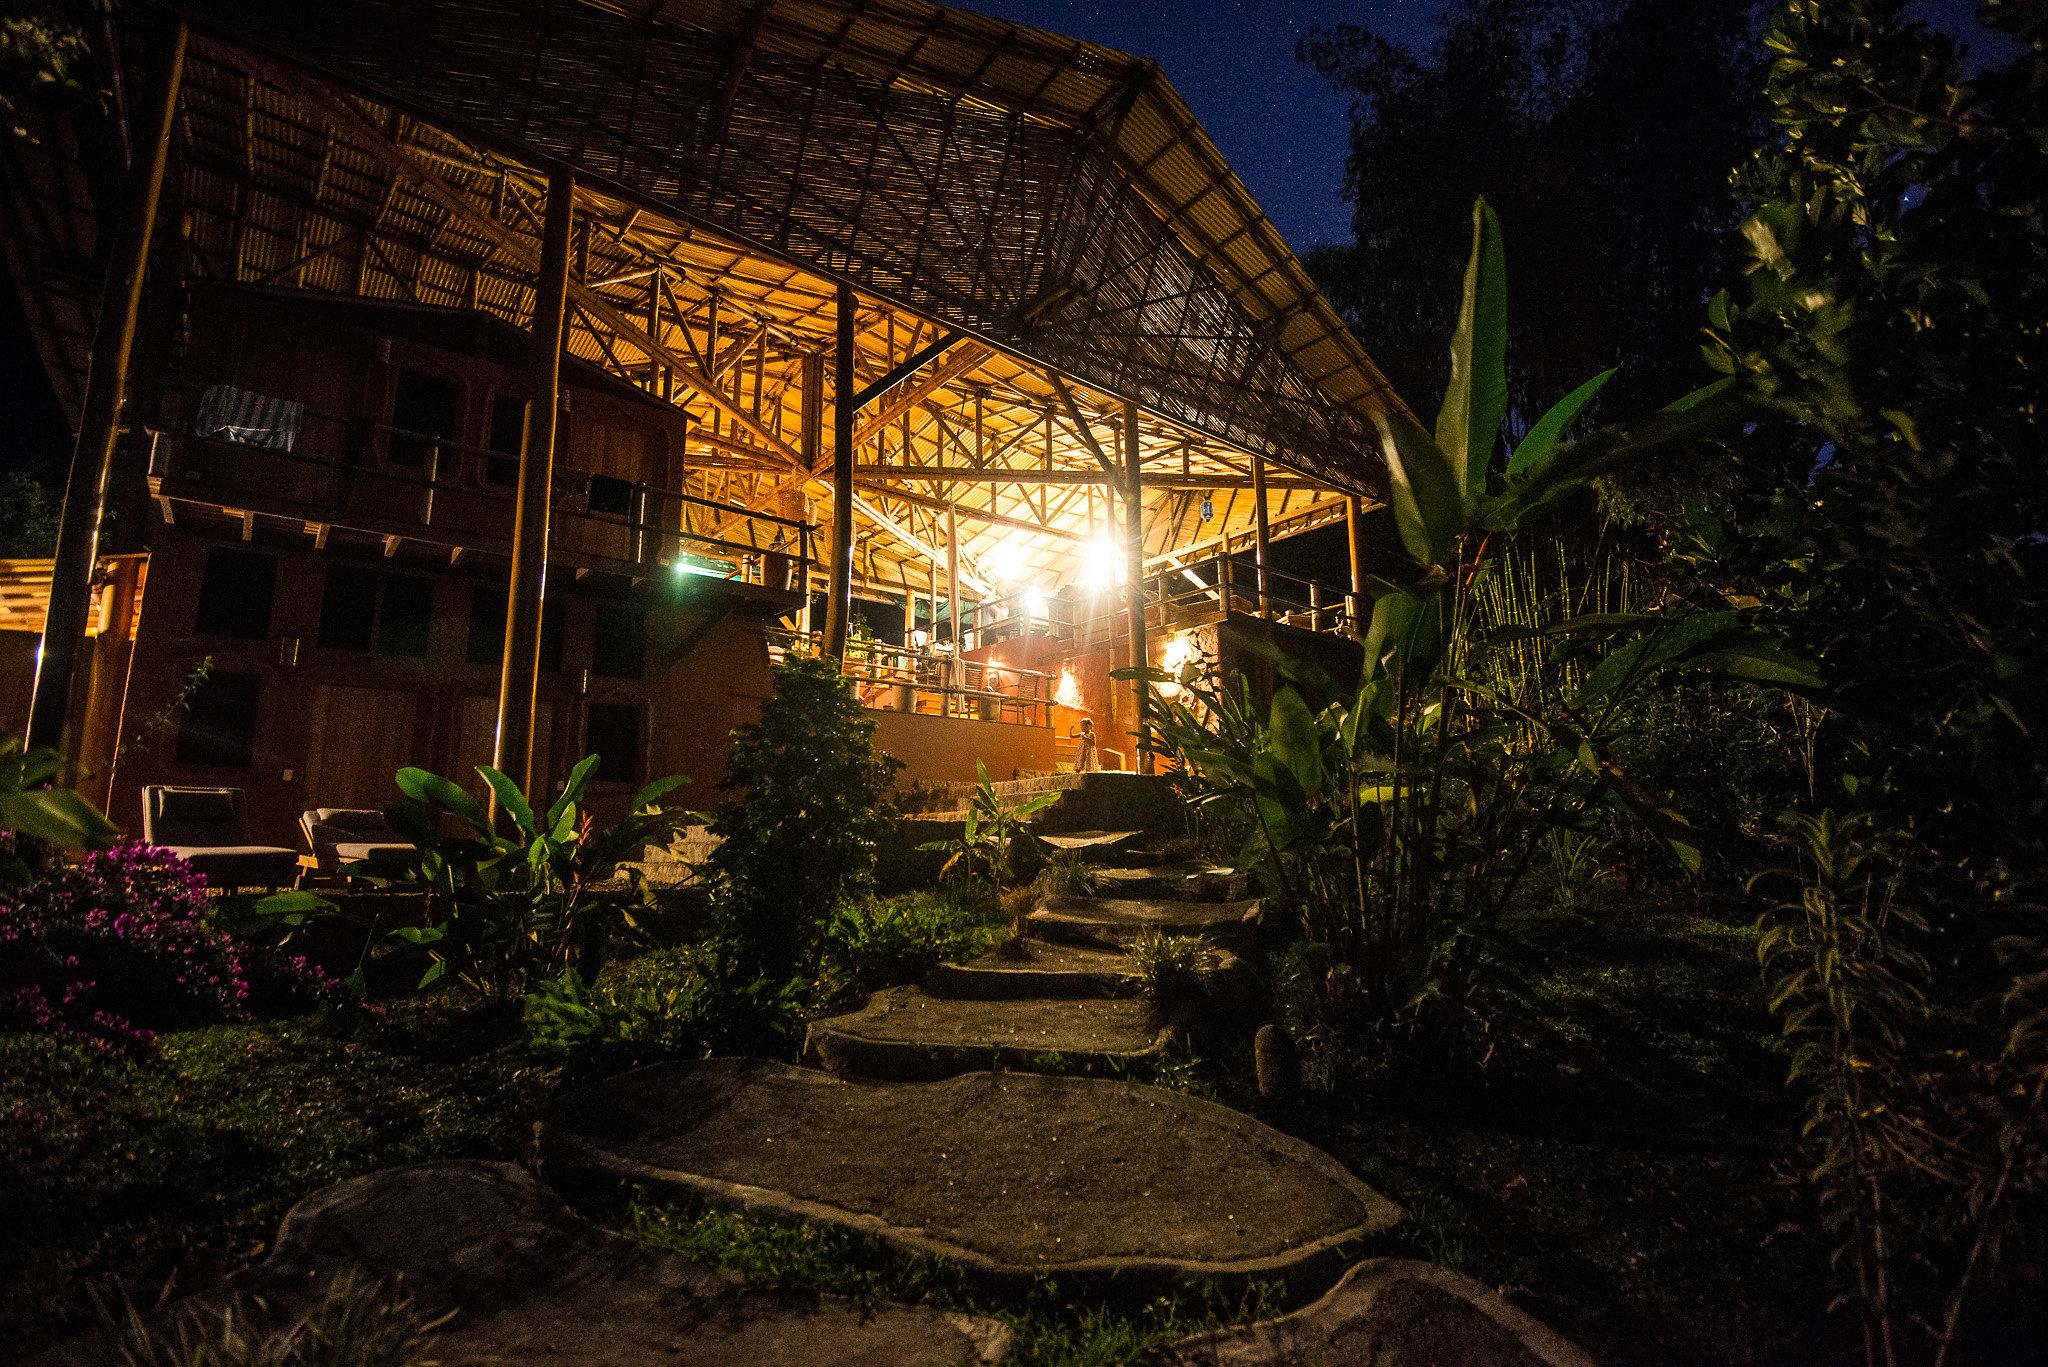 retreat_selva-armonia_yoga-november_2015-big_house_night.jpg